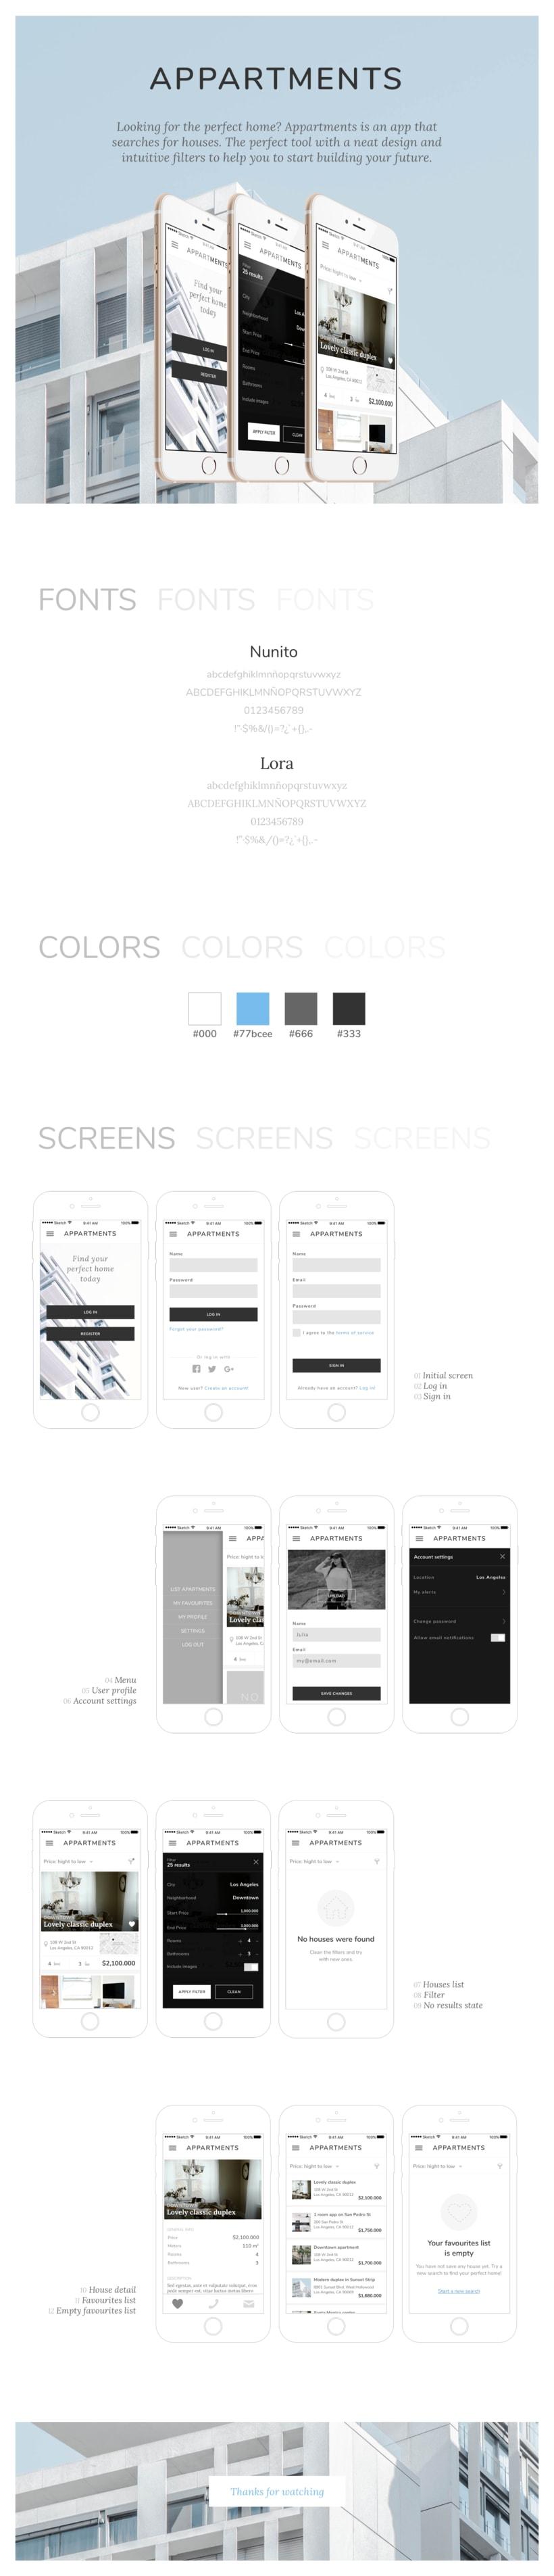 Aplicación móvil Appartments -1